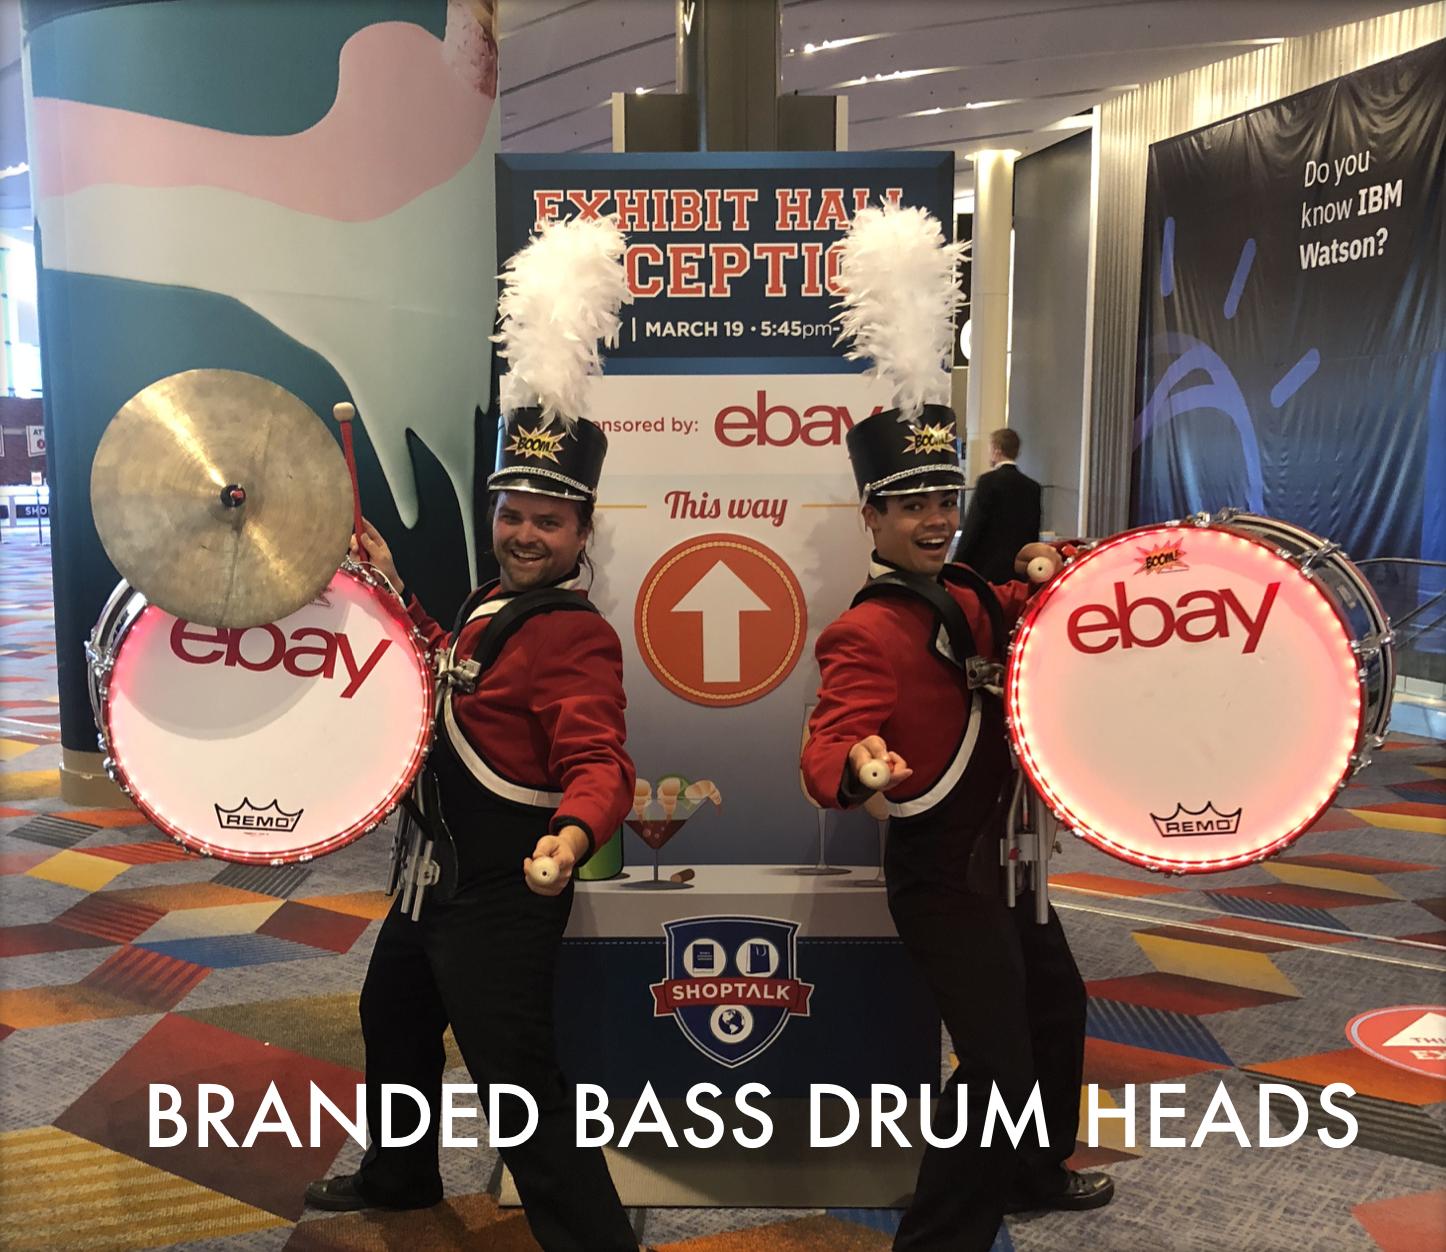 Branded Bass Drum Heads